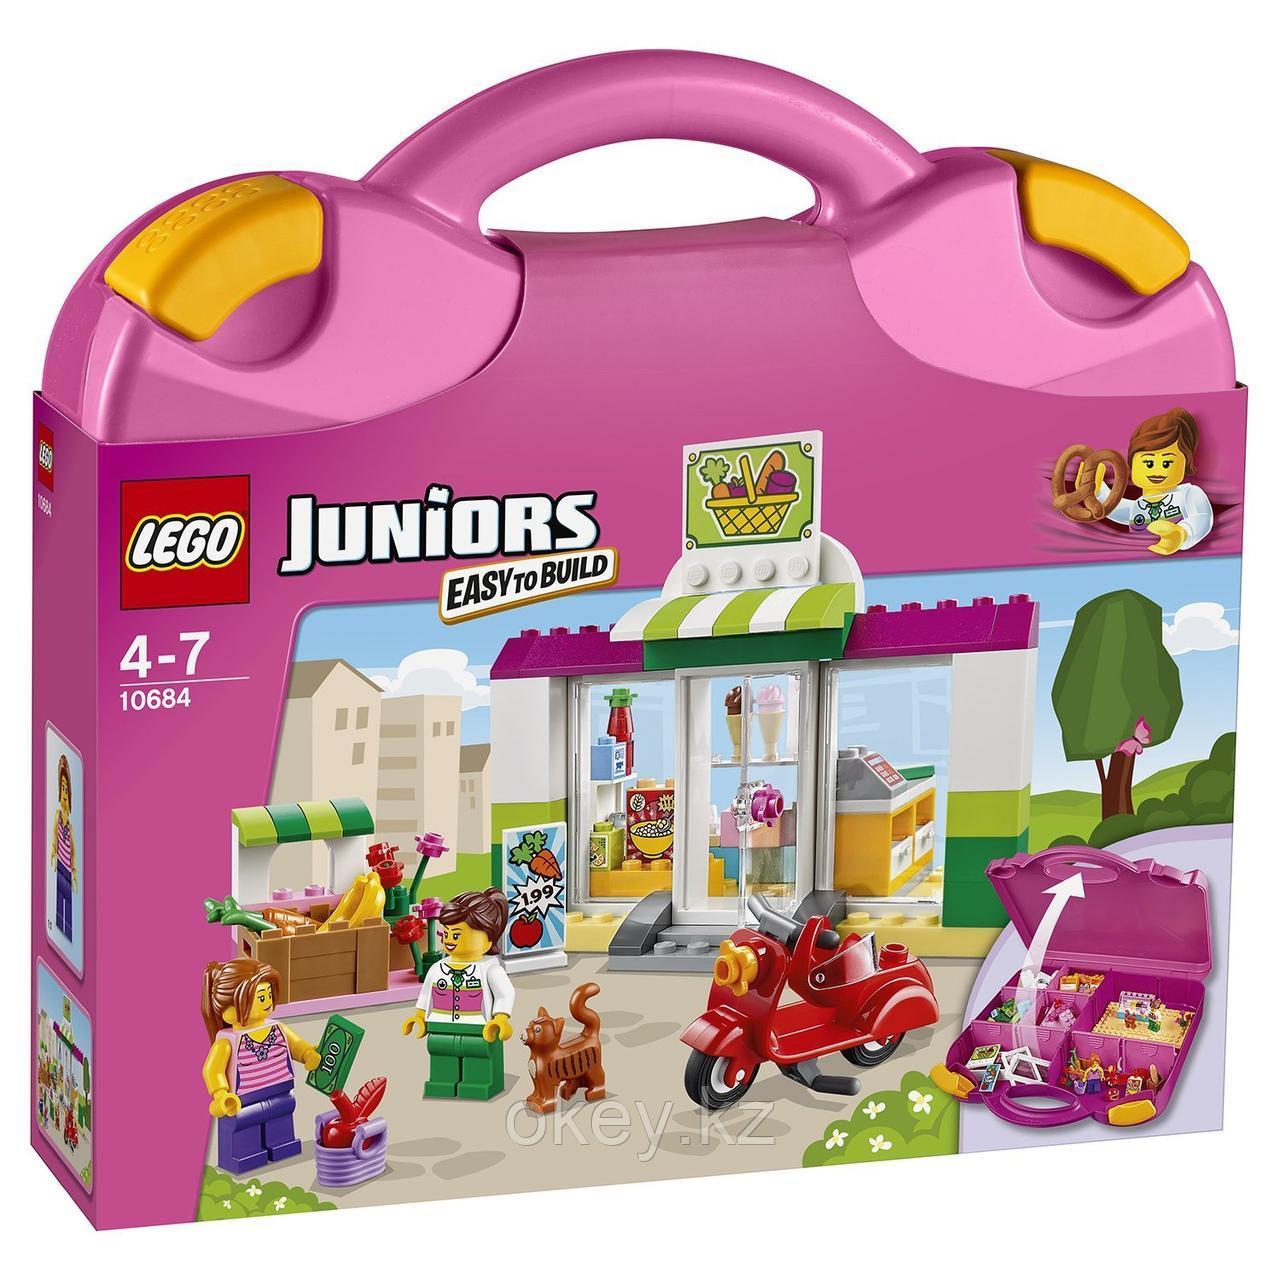 LEGO Juniors: Чемоданчик Супермаркет 10684